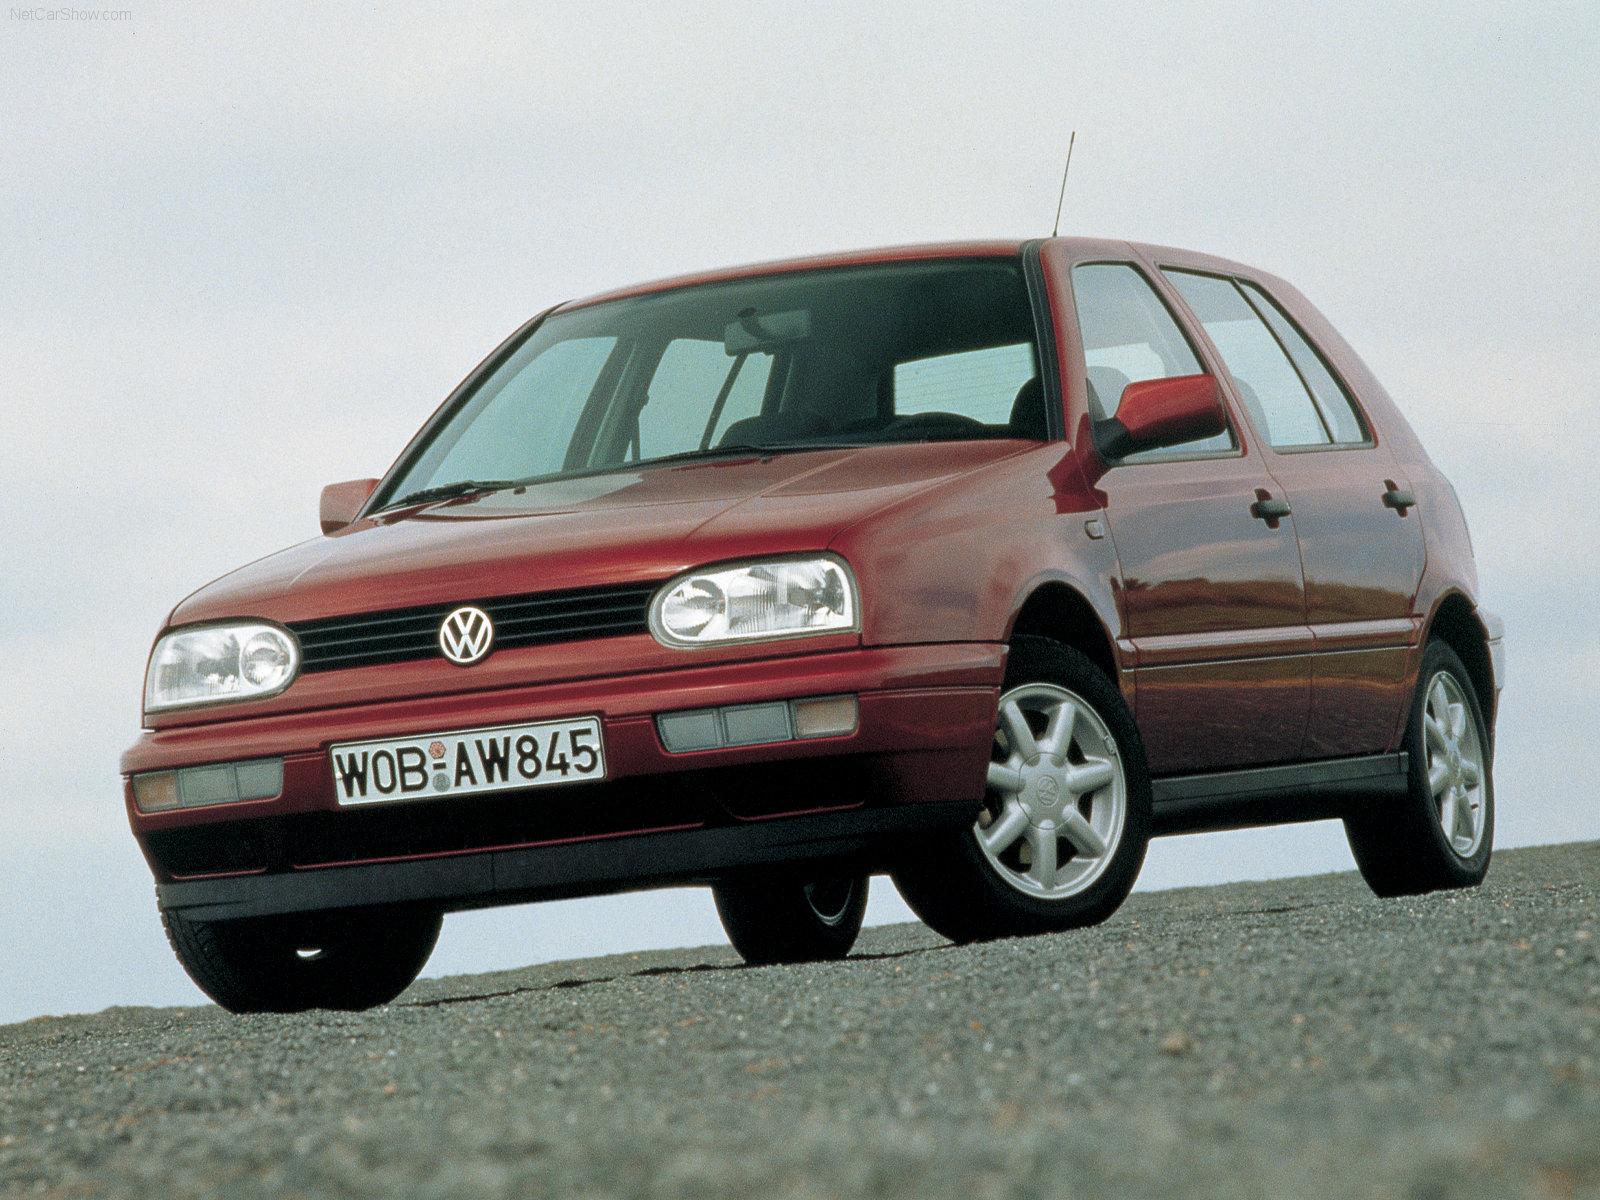 Volkswagen Golf III photos - PhotoGallery with 11 pics ...